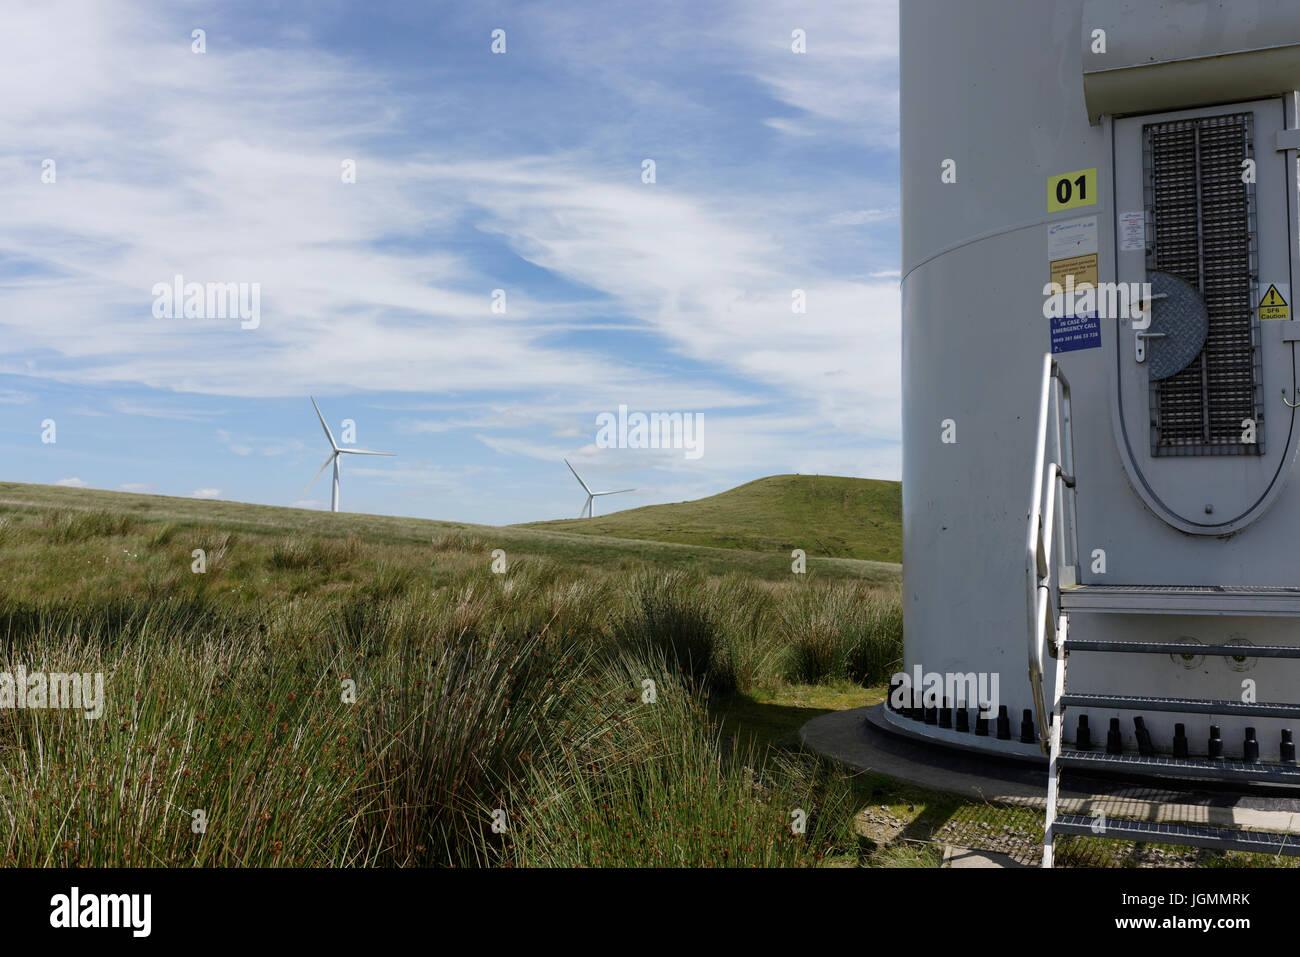 Steel access door on Wind turbine at scout moor wind farm - Stock Image